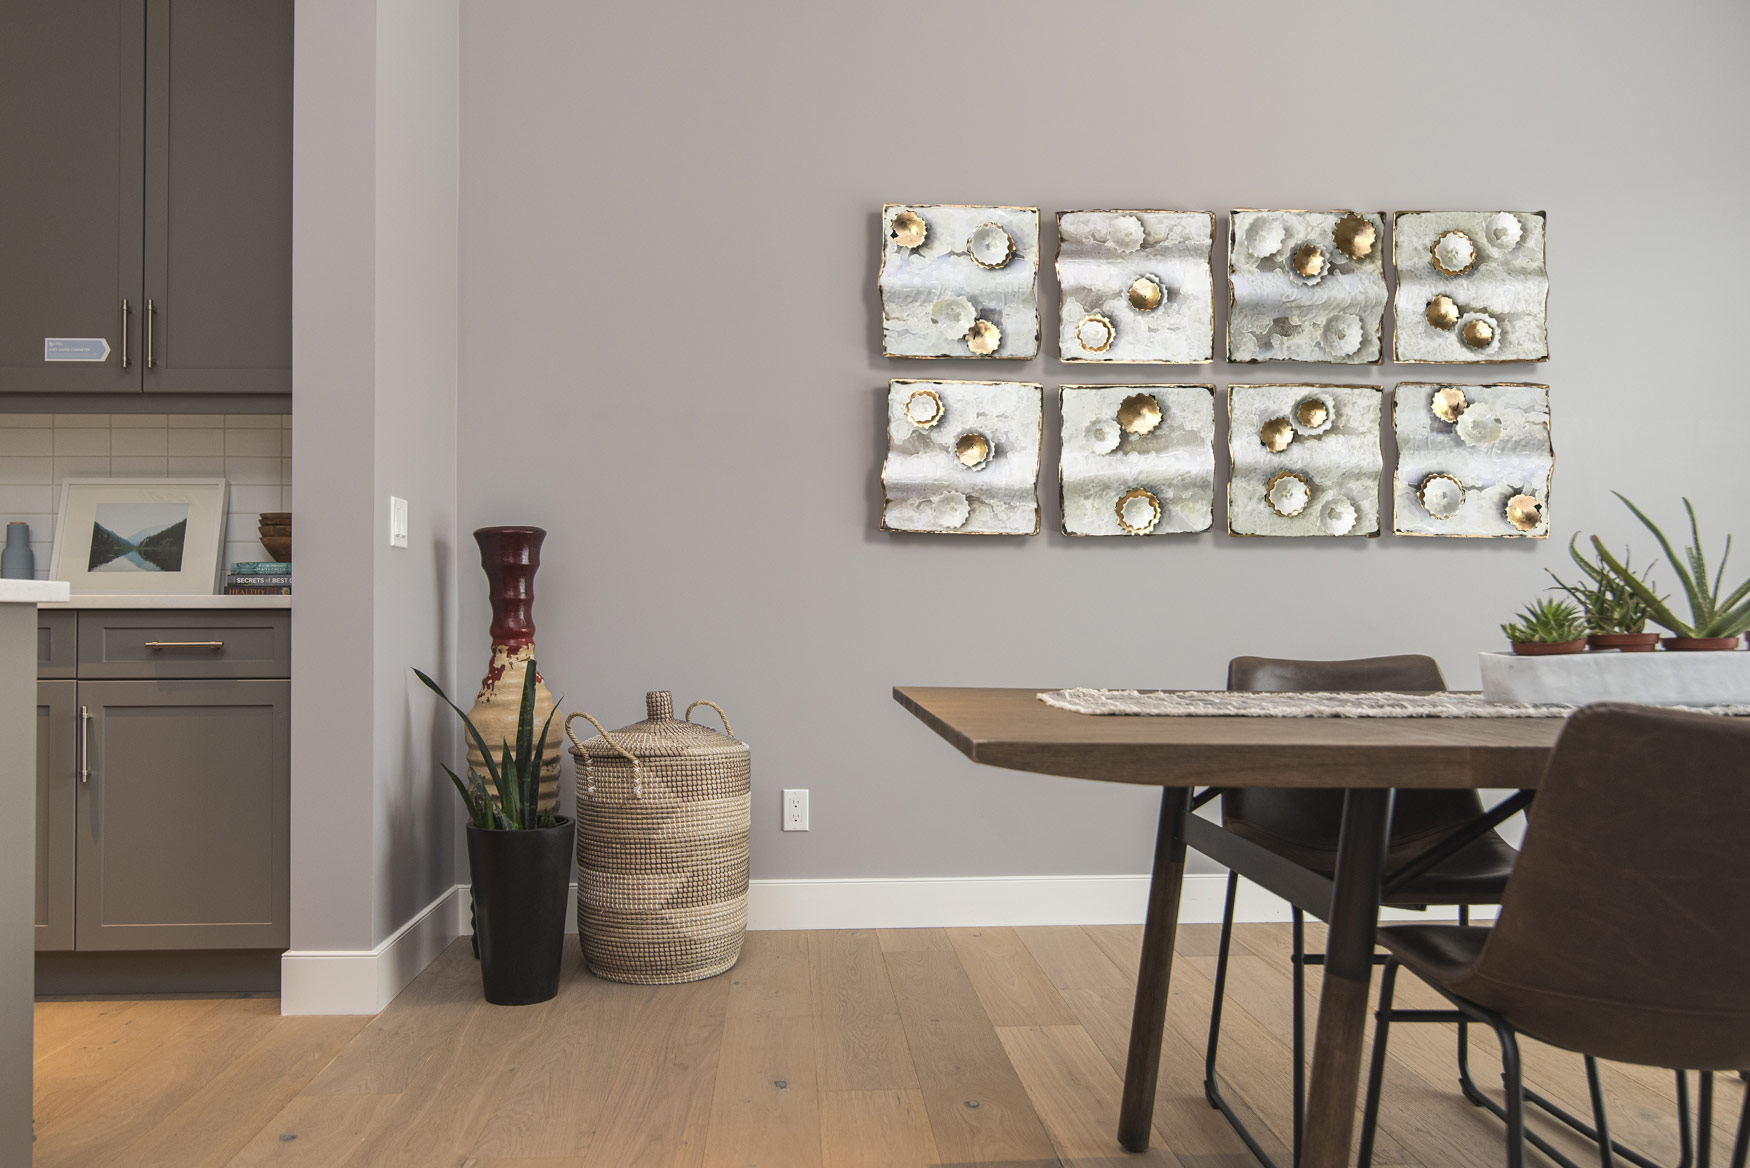 Debra Steidel Wall sculpture interior design ivory and gold